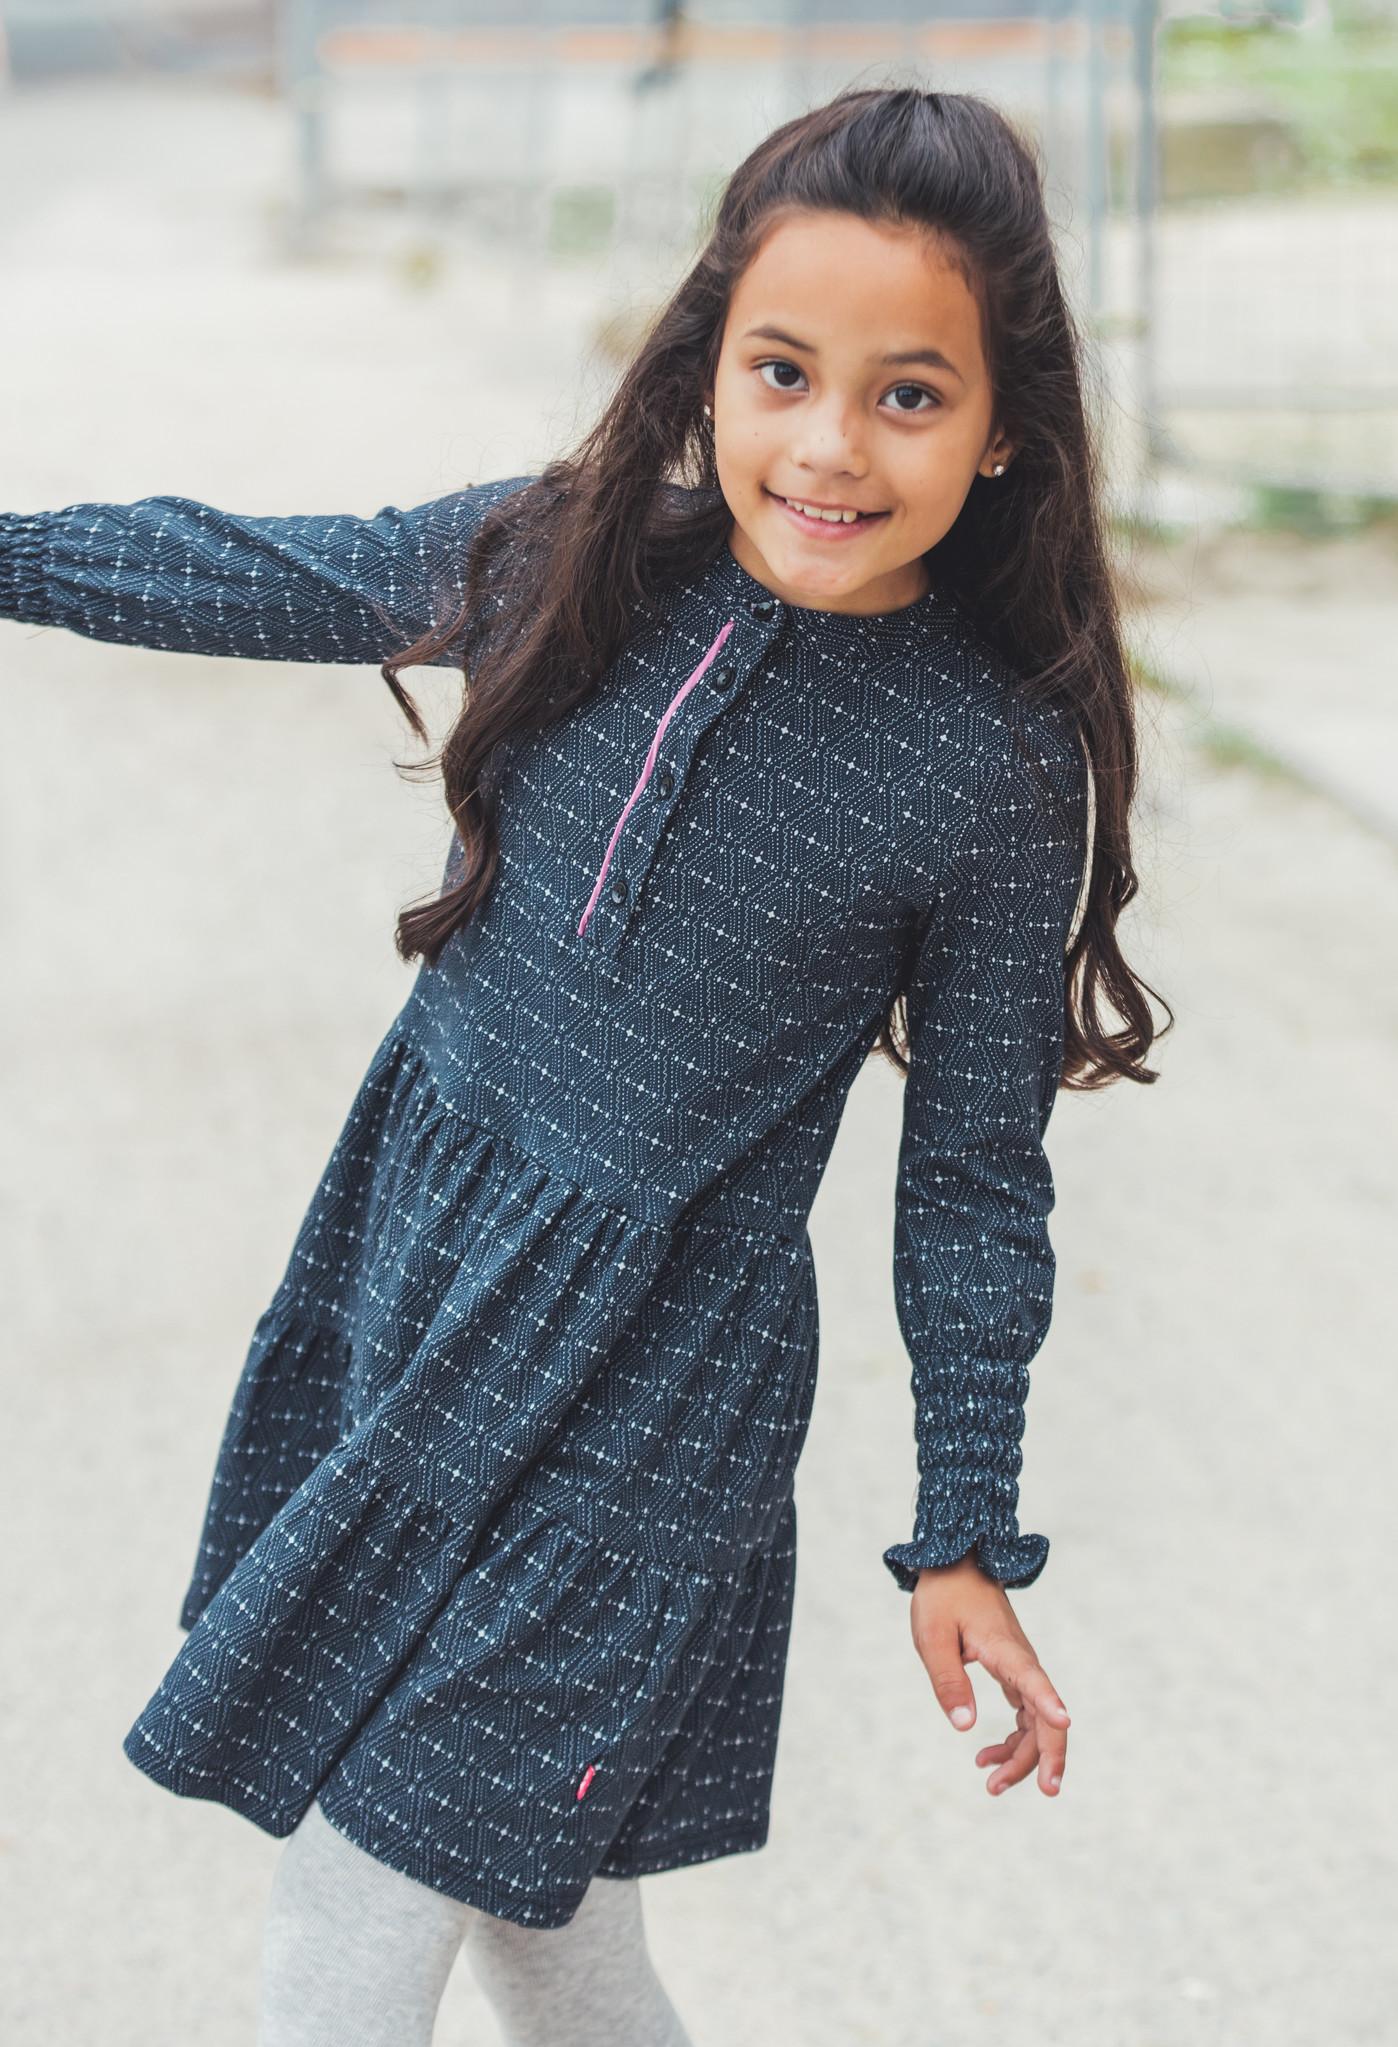 Mayce Girlslabel lookbook winter 2022-40